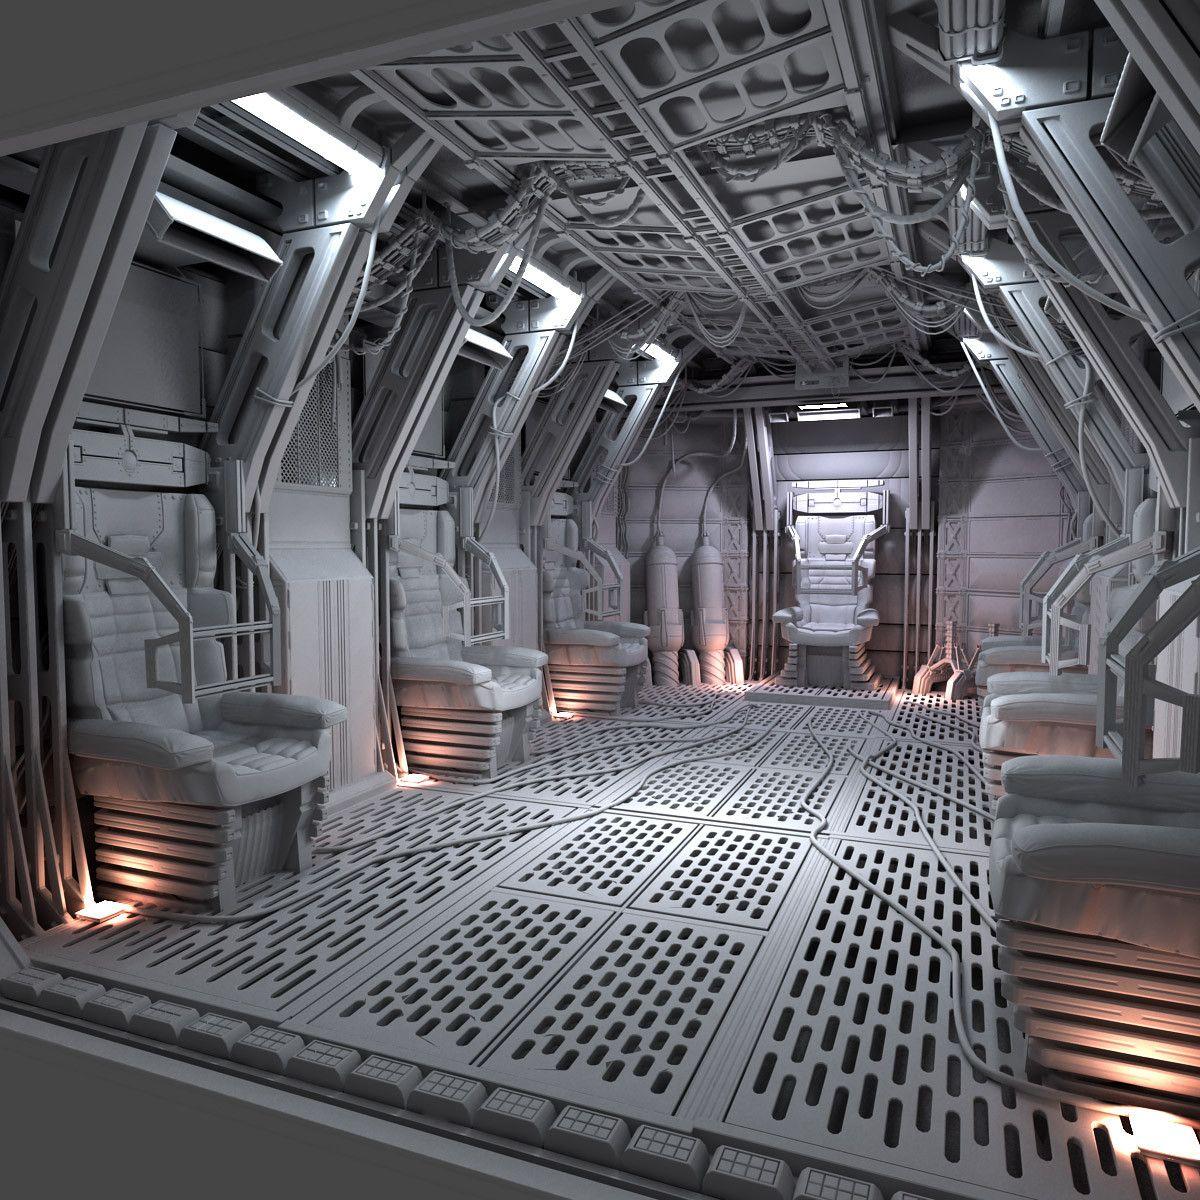 space shuttle interior tour - photo #23